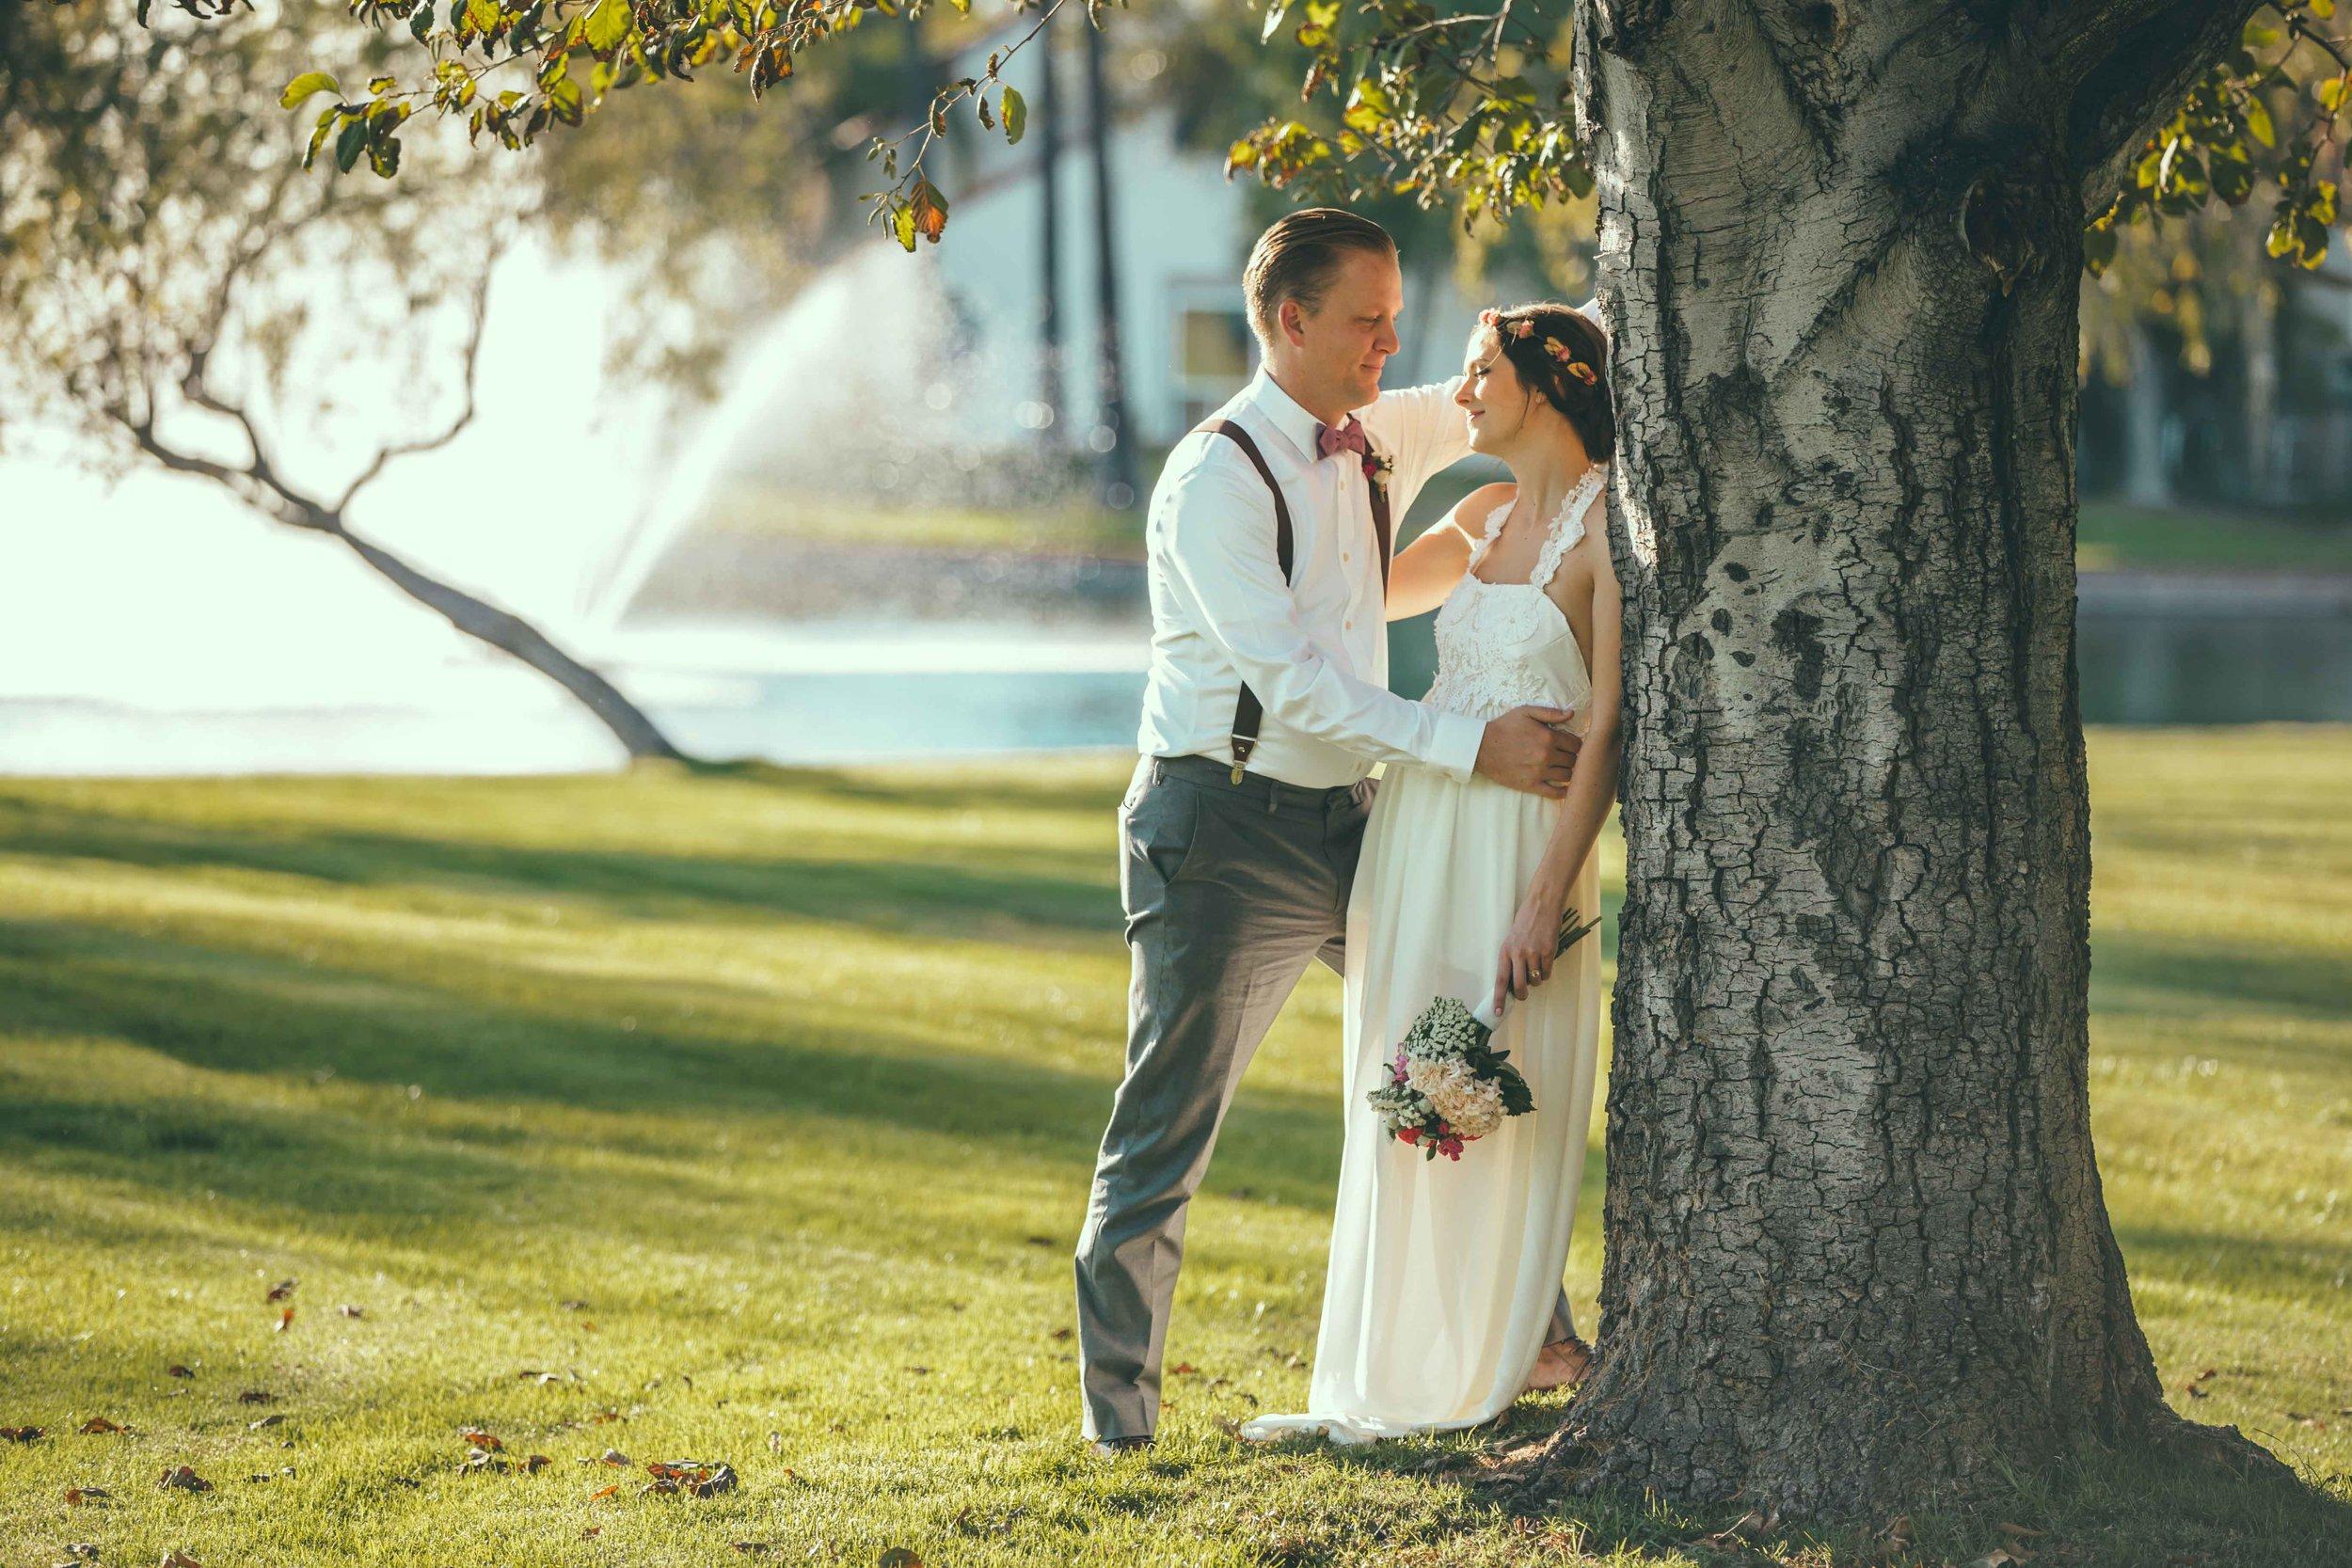 20141024-DePartee-Wedding-APavone-040-sm.jpg